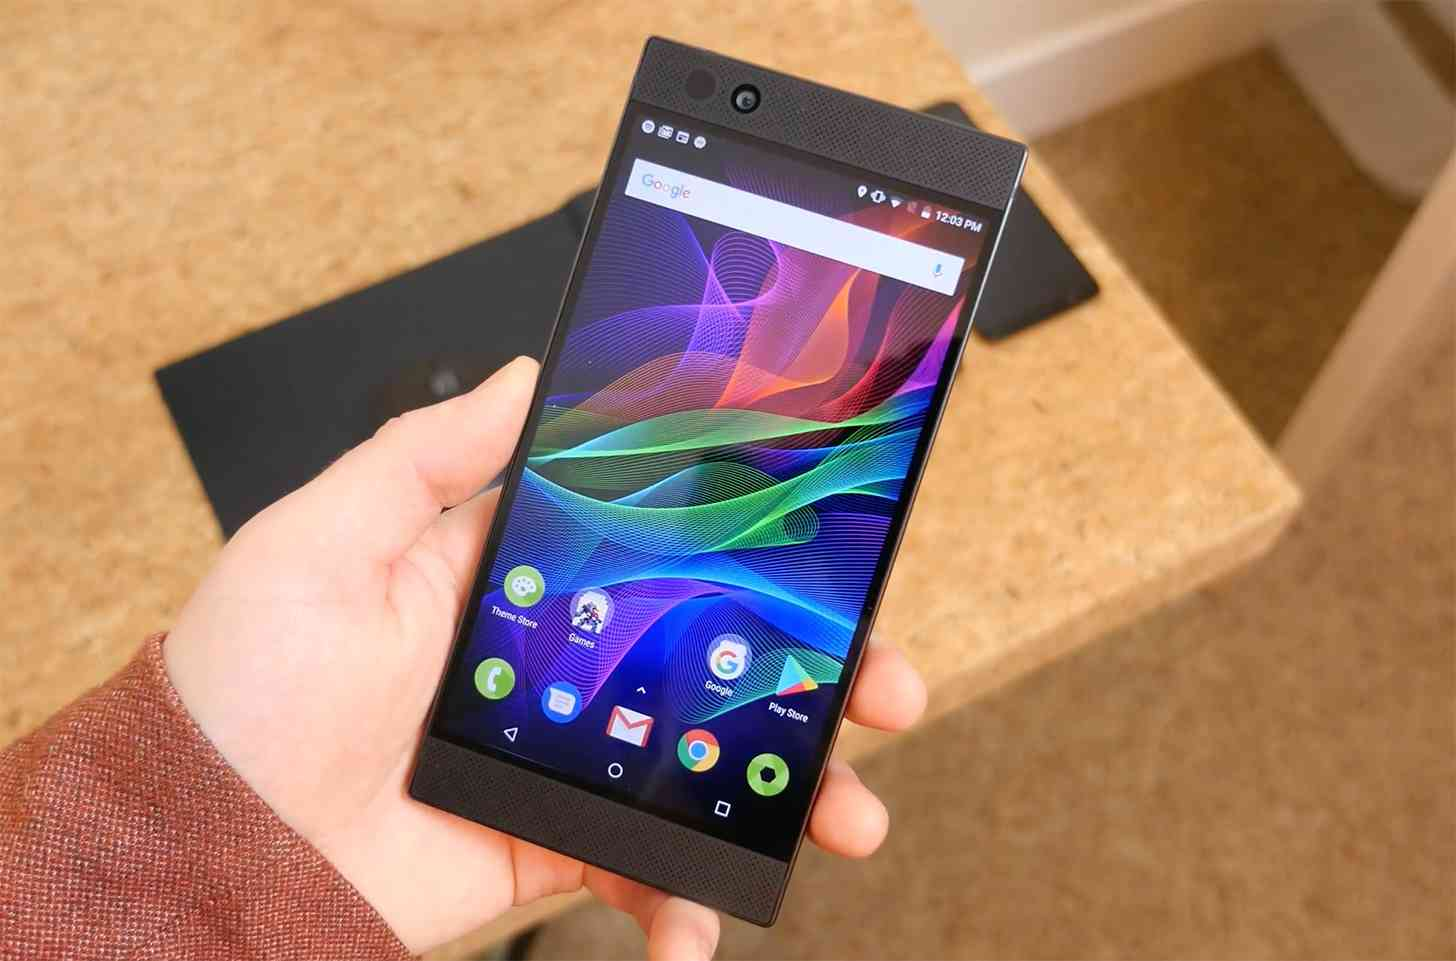 Razer Phone hands-on video